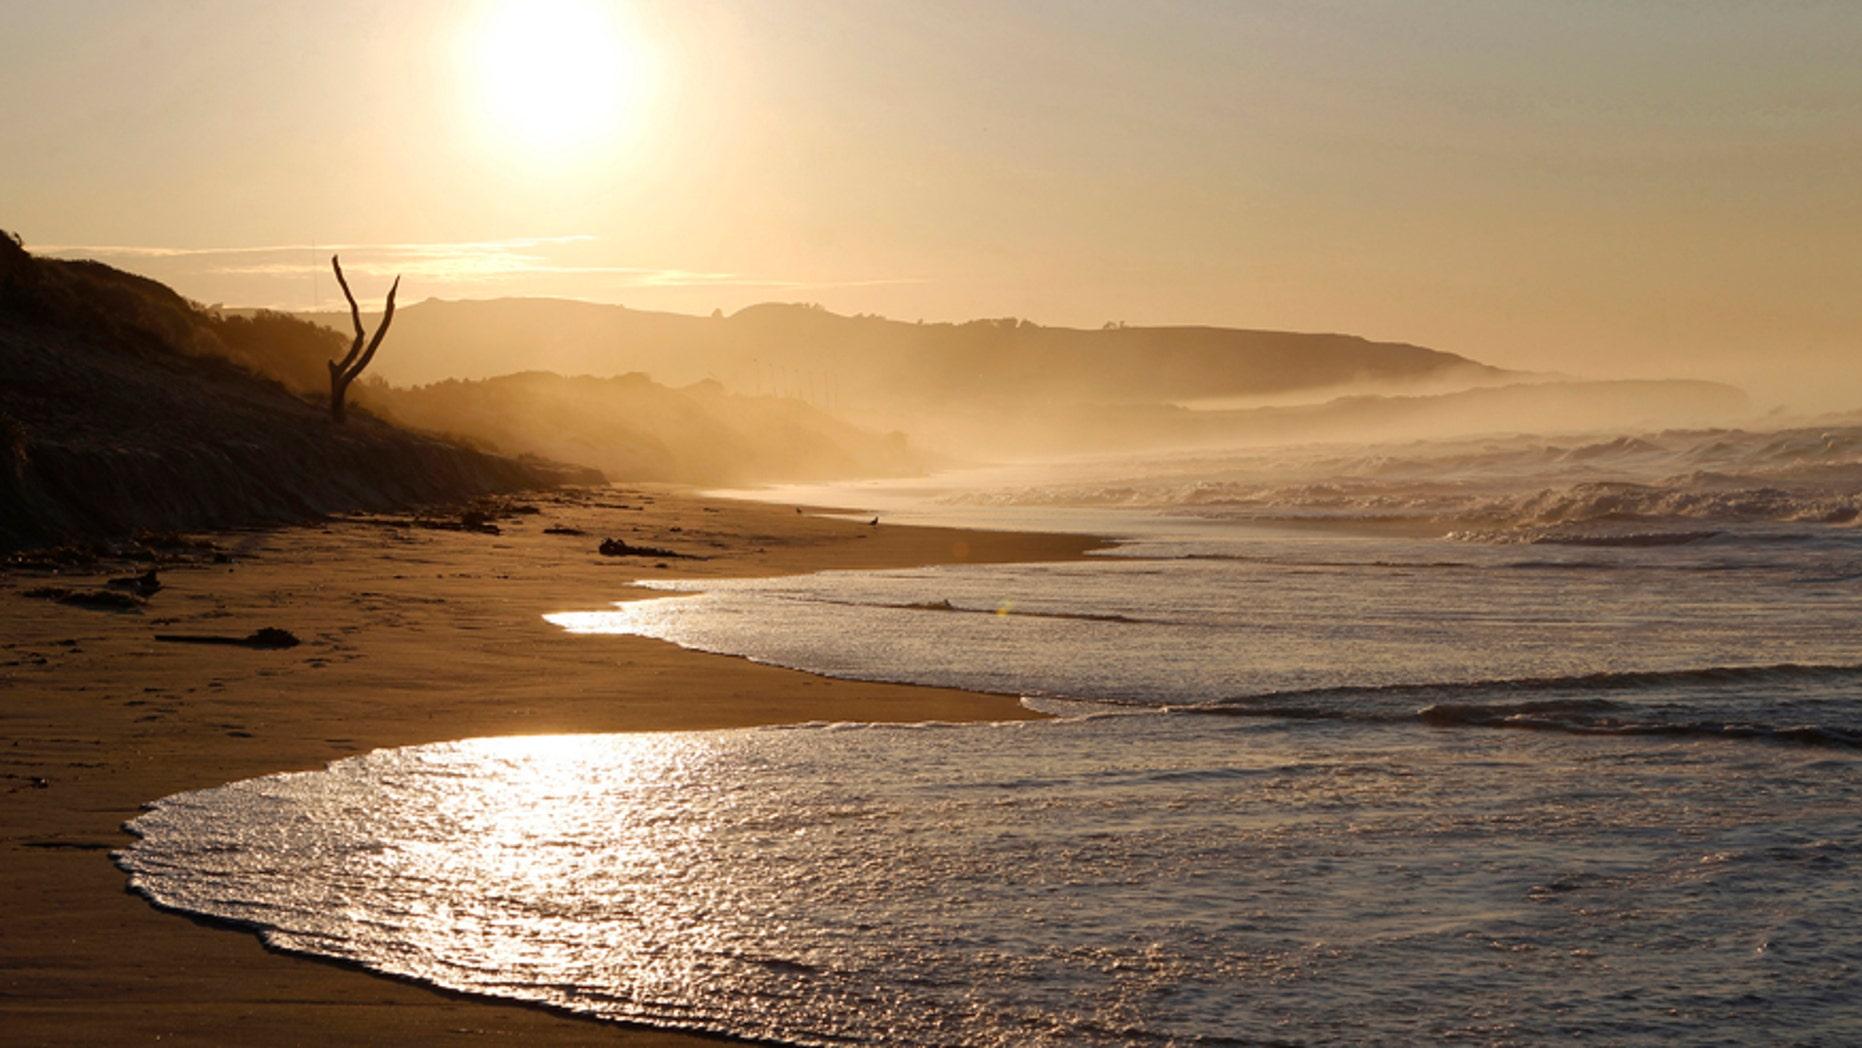 File photo - The sun rises over St. Clair beach in Dunedin Sept. 5, 2011. (REUTERS/Brandon Malone)